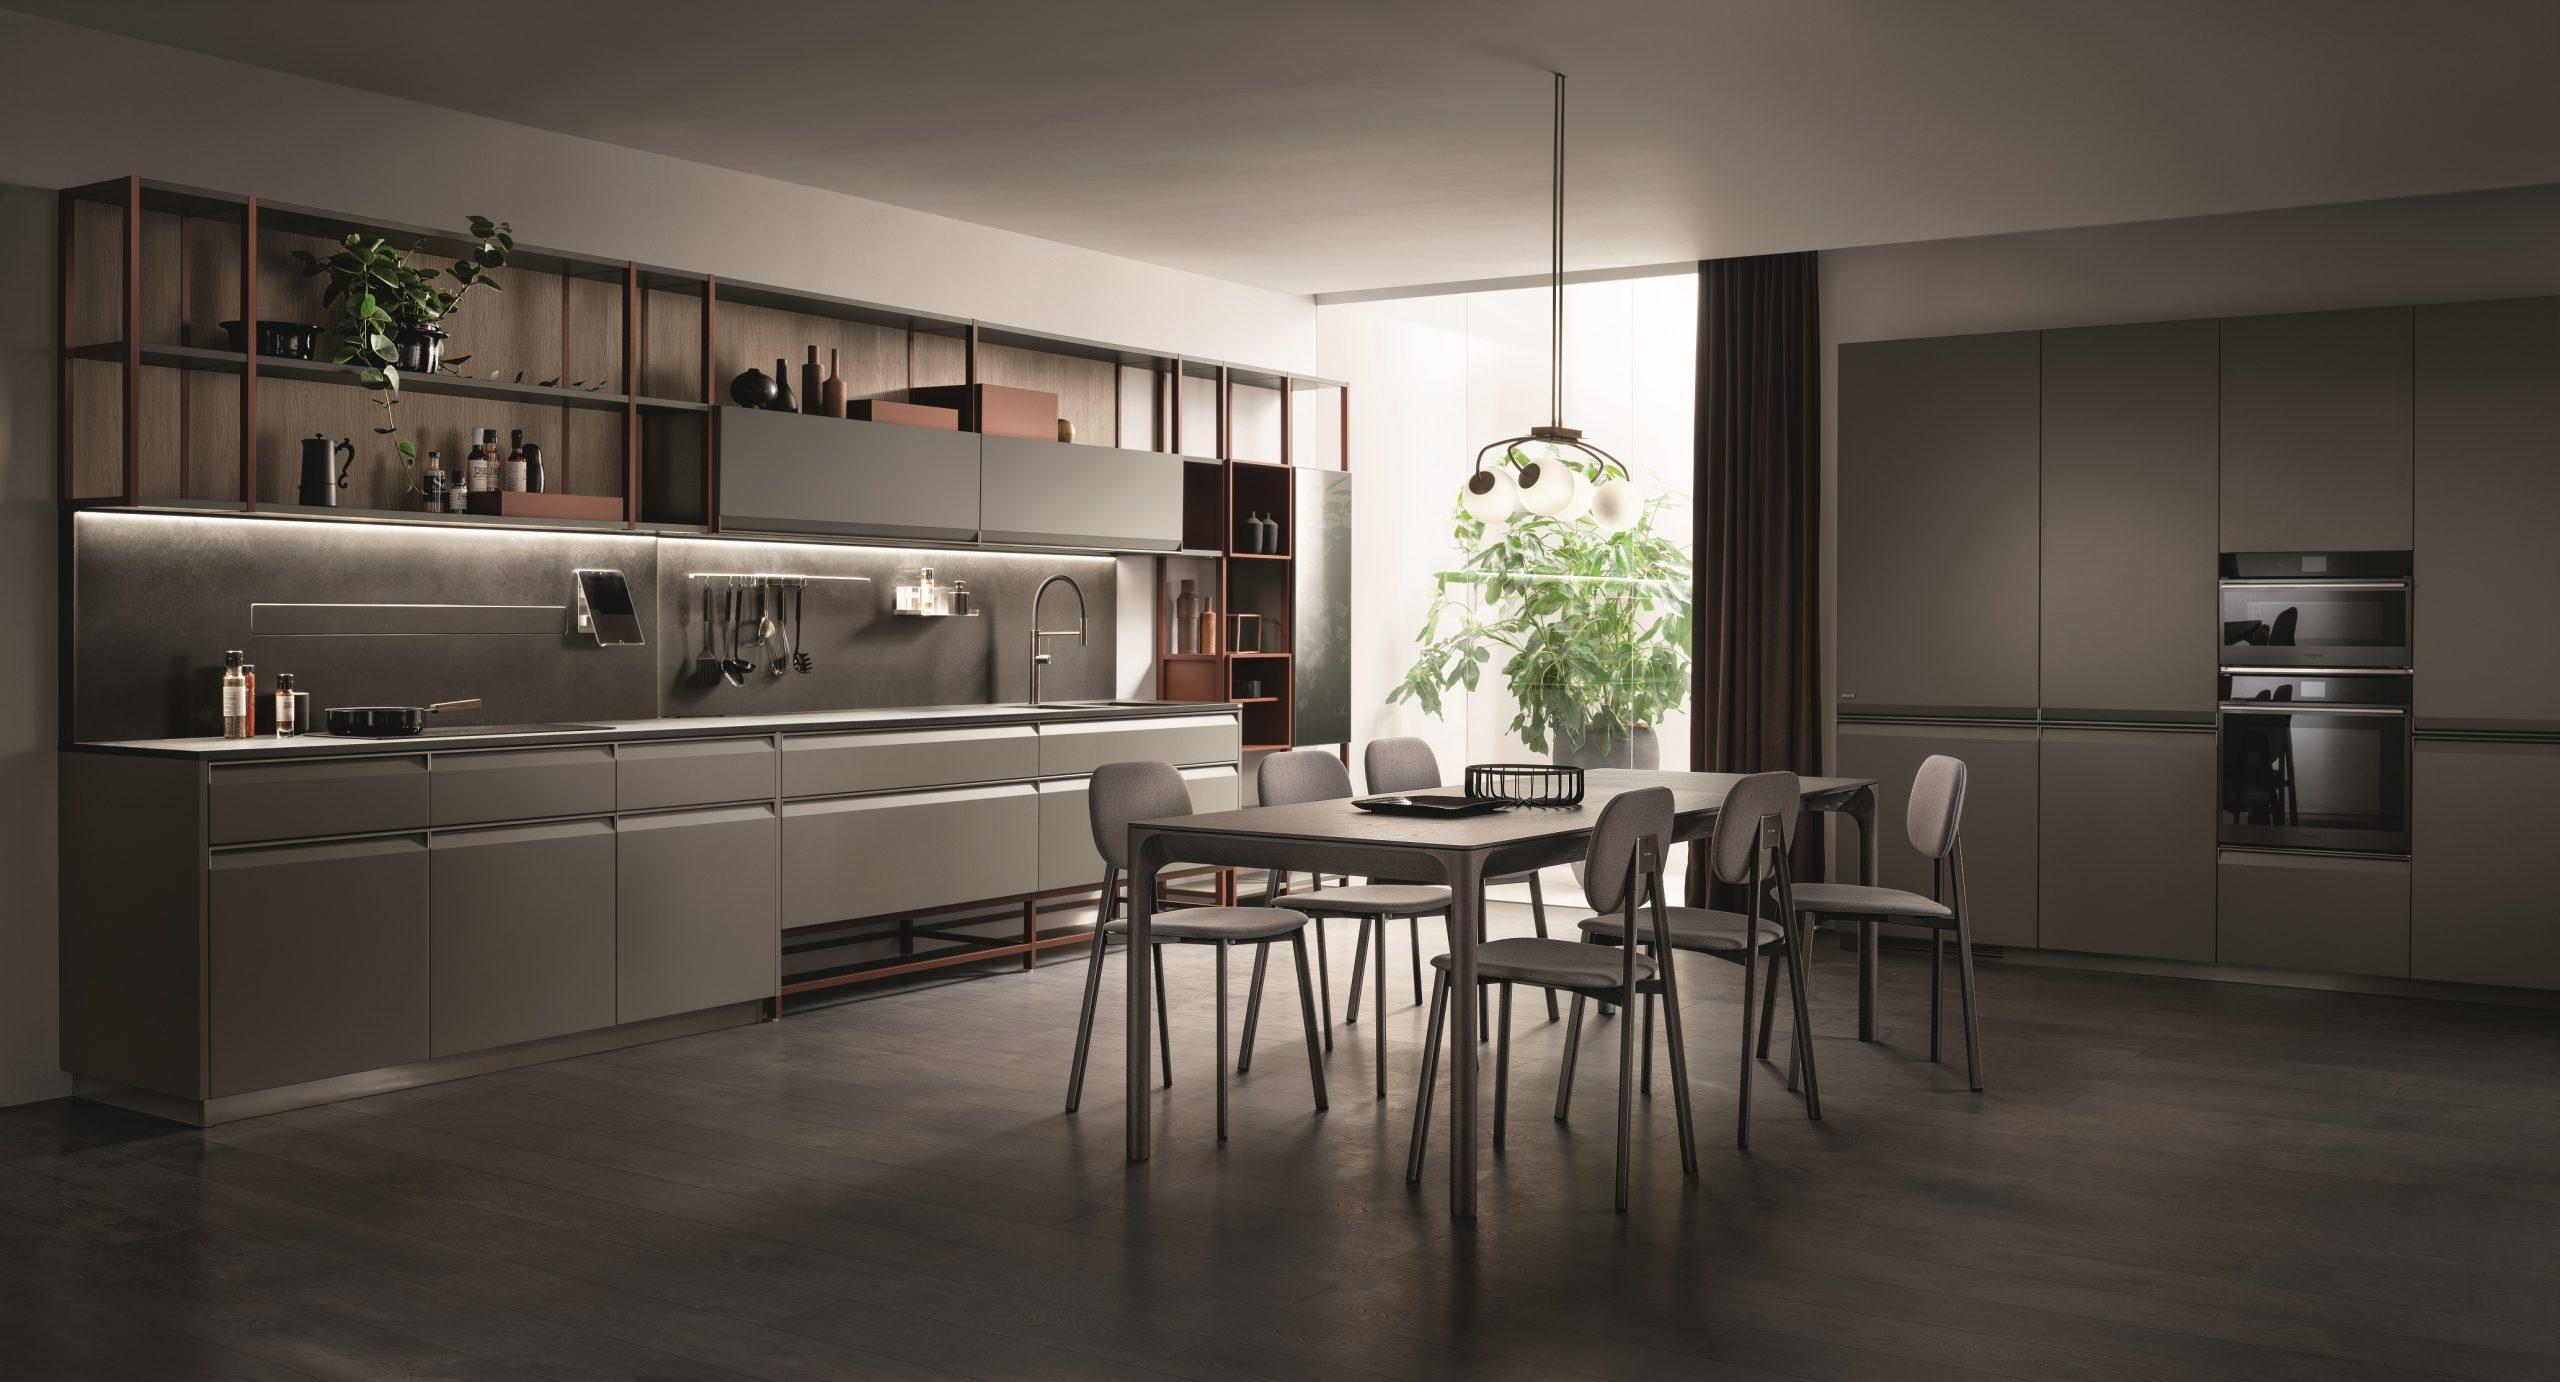 Scavolini dévoile sa nouvelle collection design : Formalia